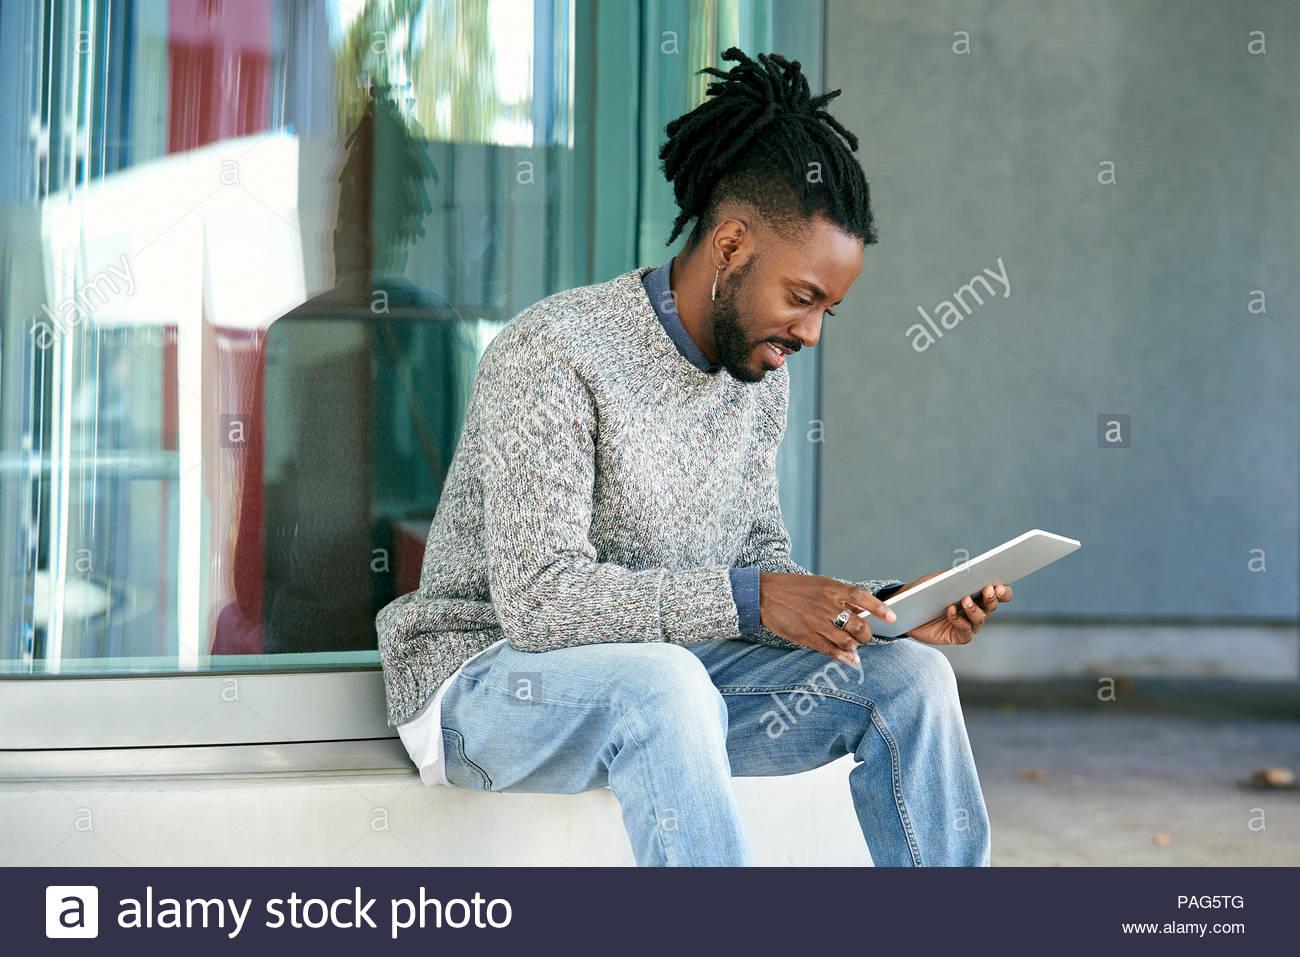 Man using digital tablet - Stock Image